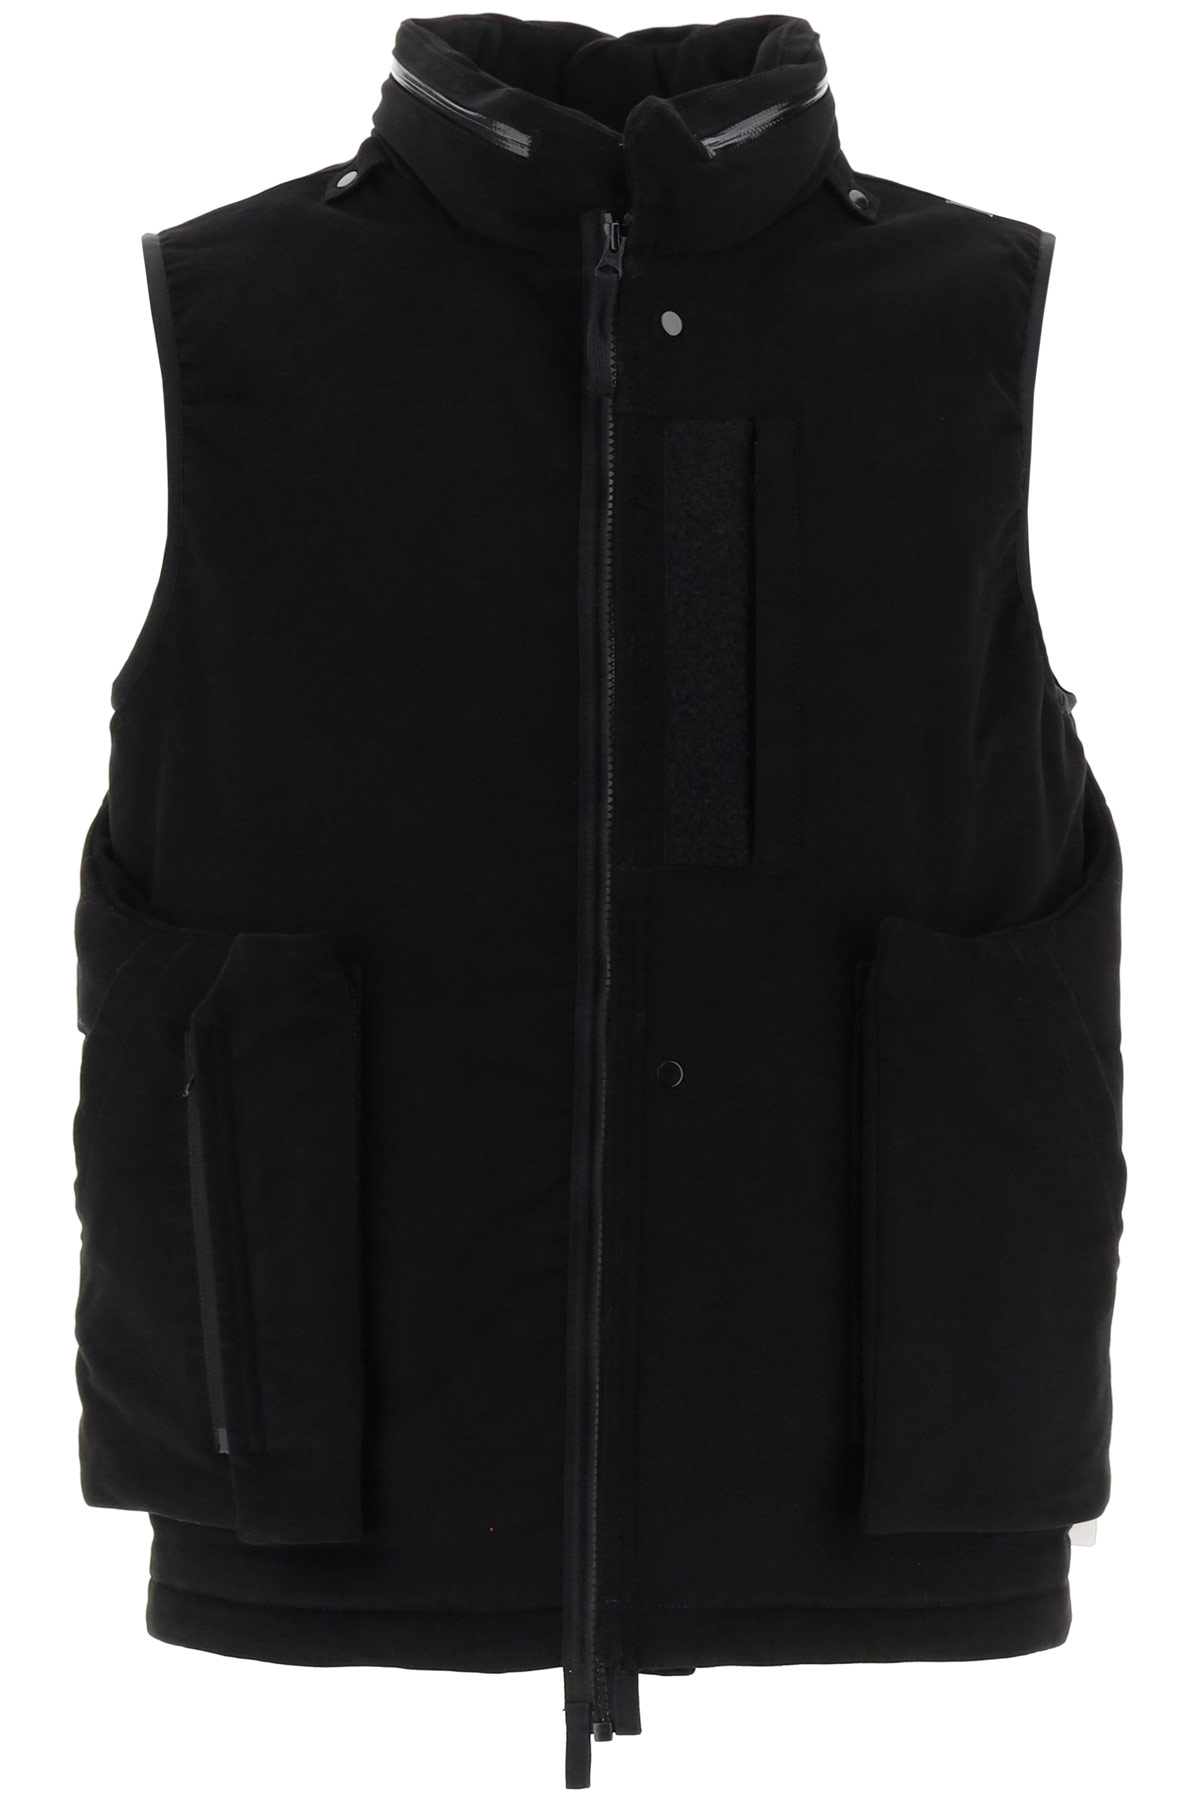 STONE ISLAND SHADOW PROJECT 남자 아우터 점퍼 Puffer jackets MO7319G01B2 V0029